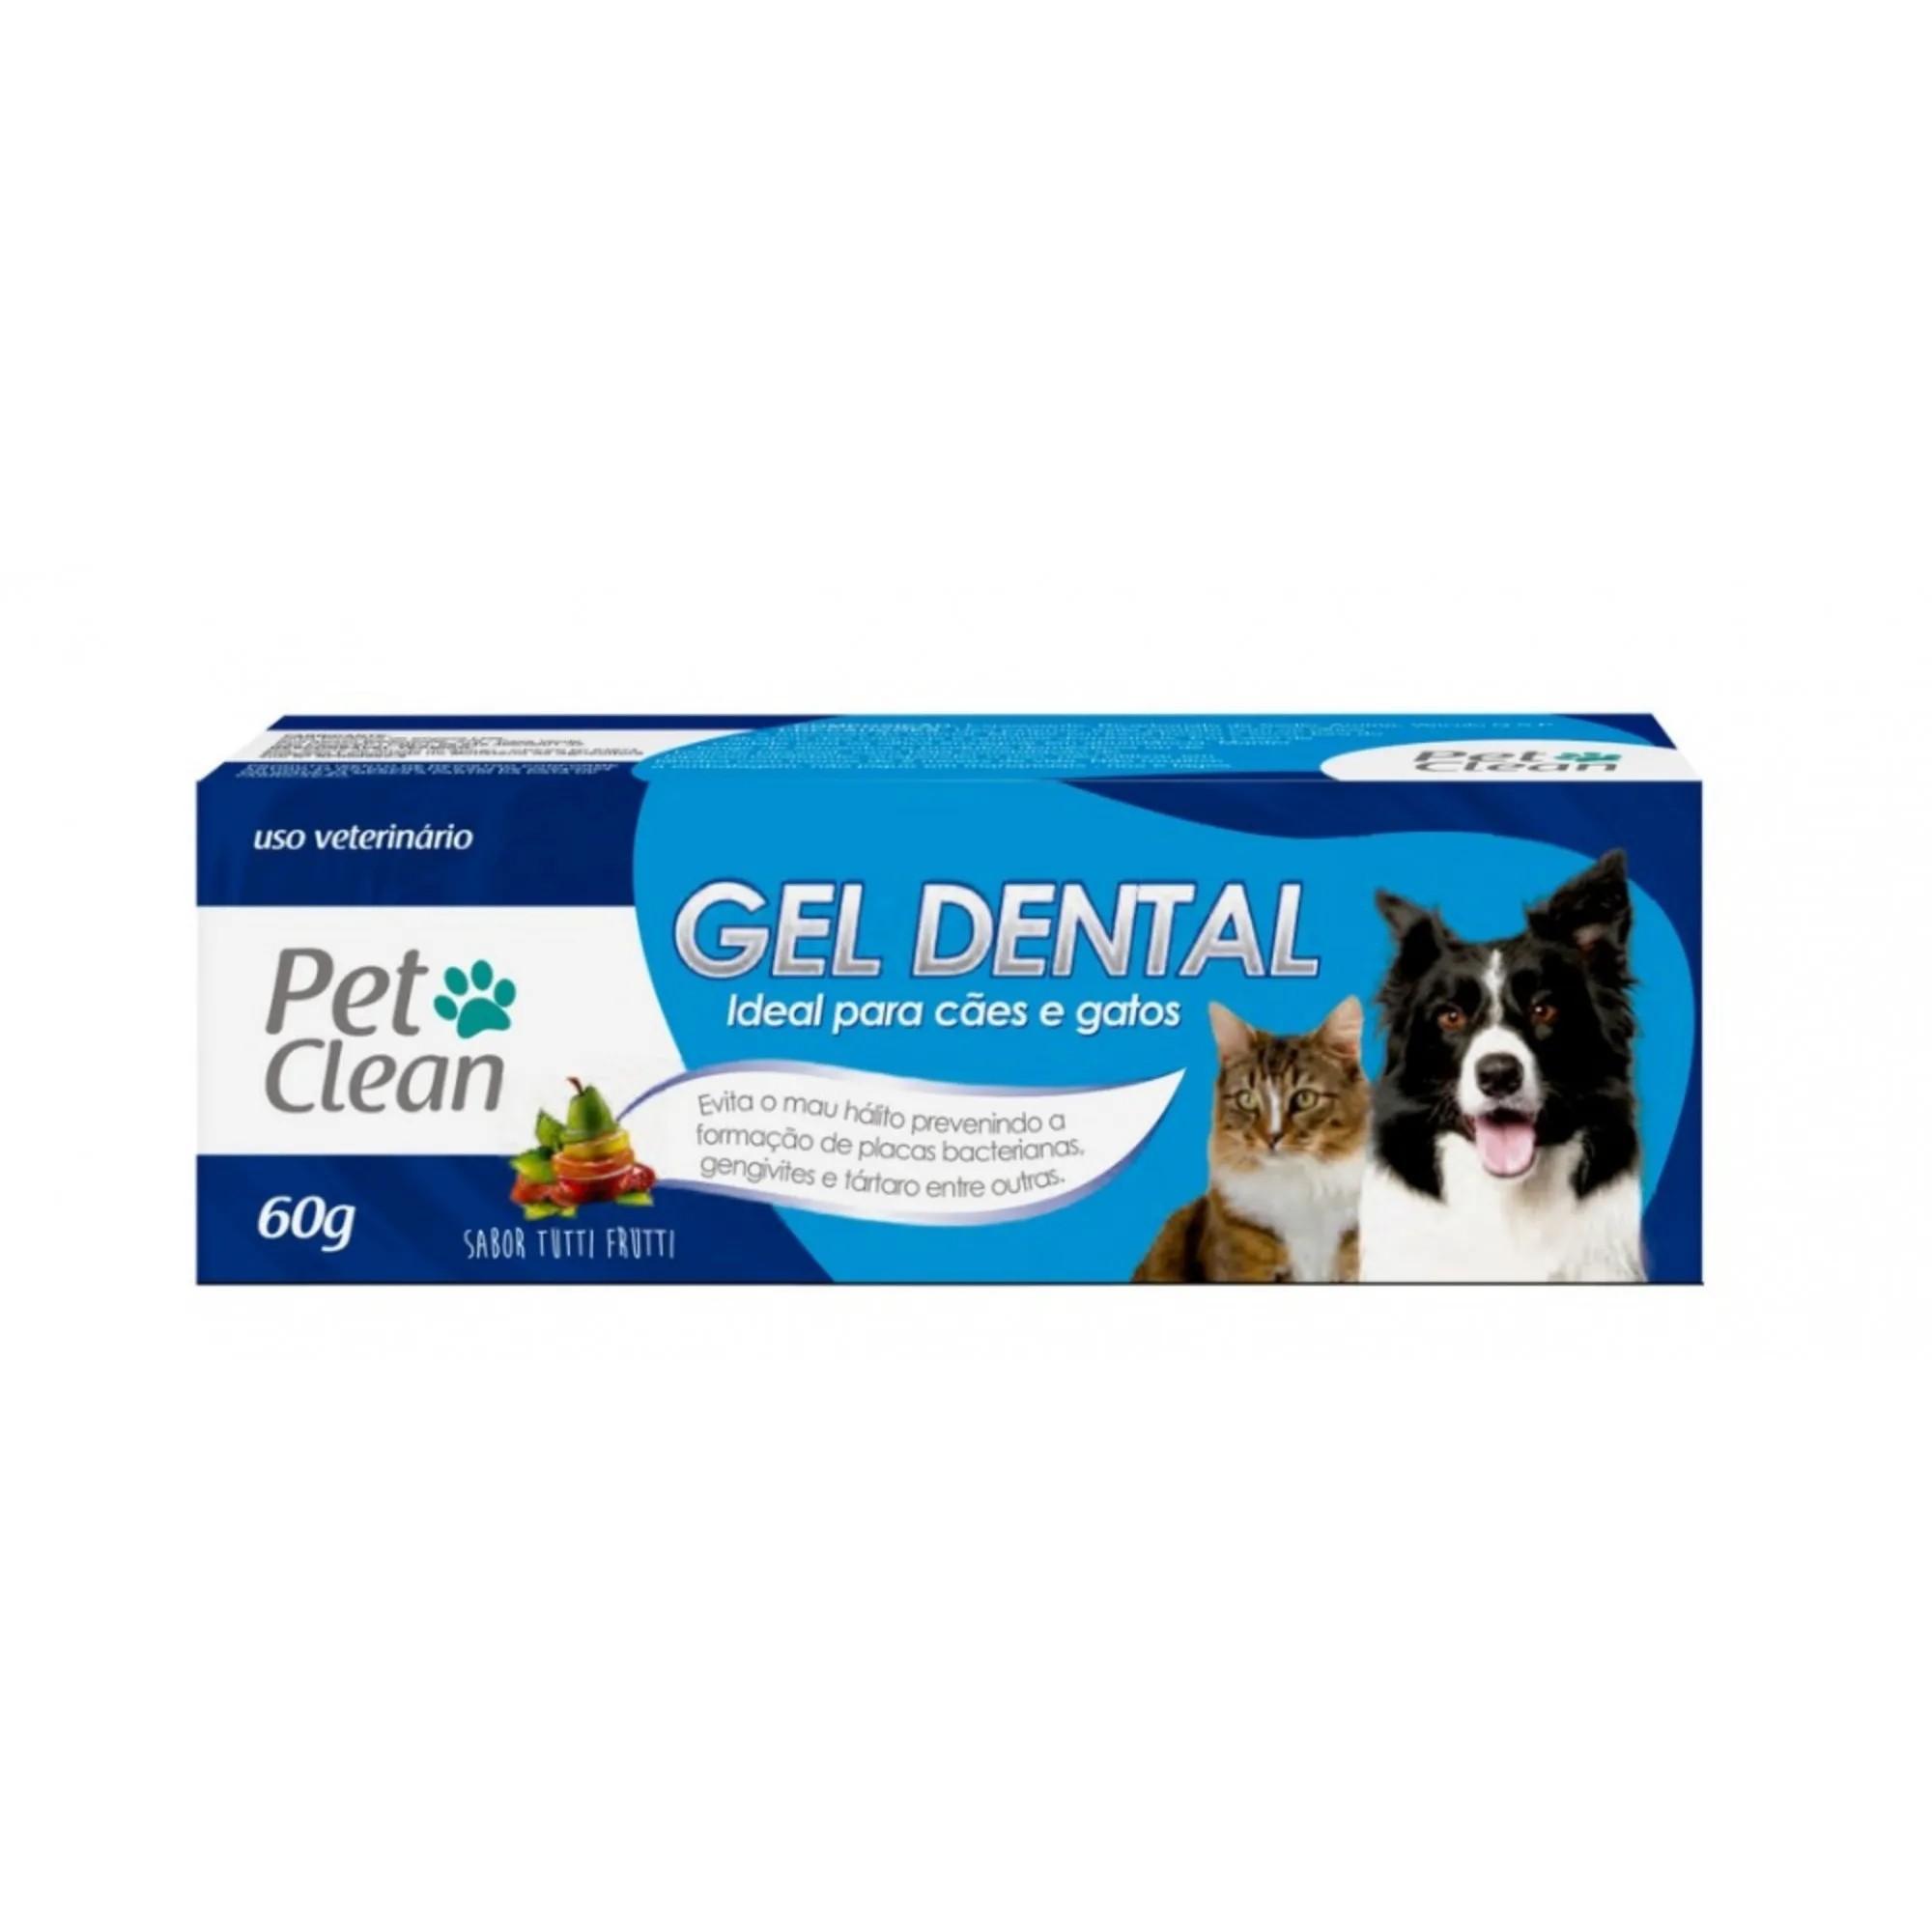 Gel dental Pet Clean Tutti-Frutii 60g